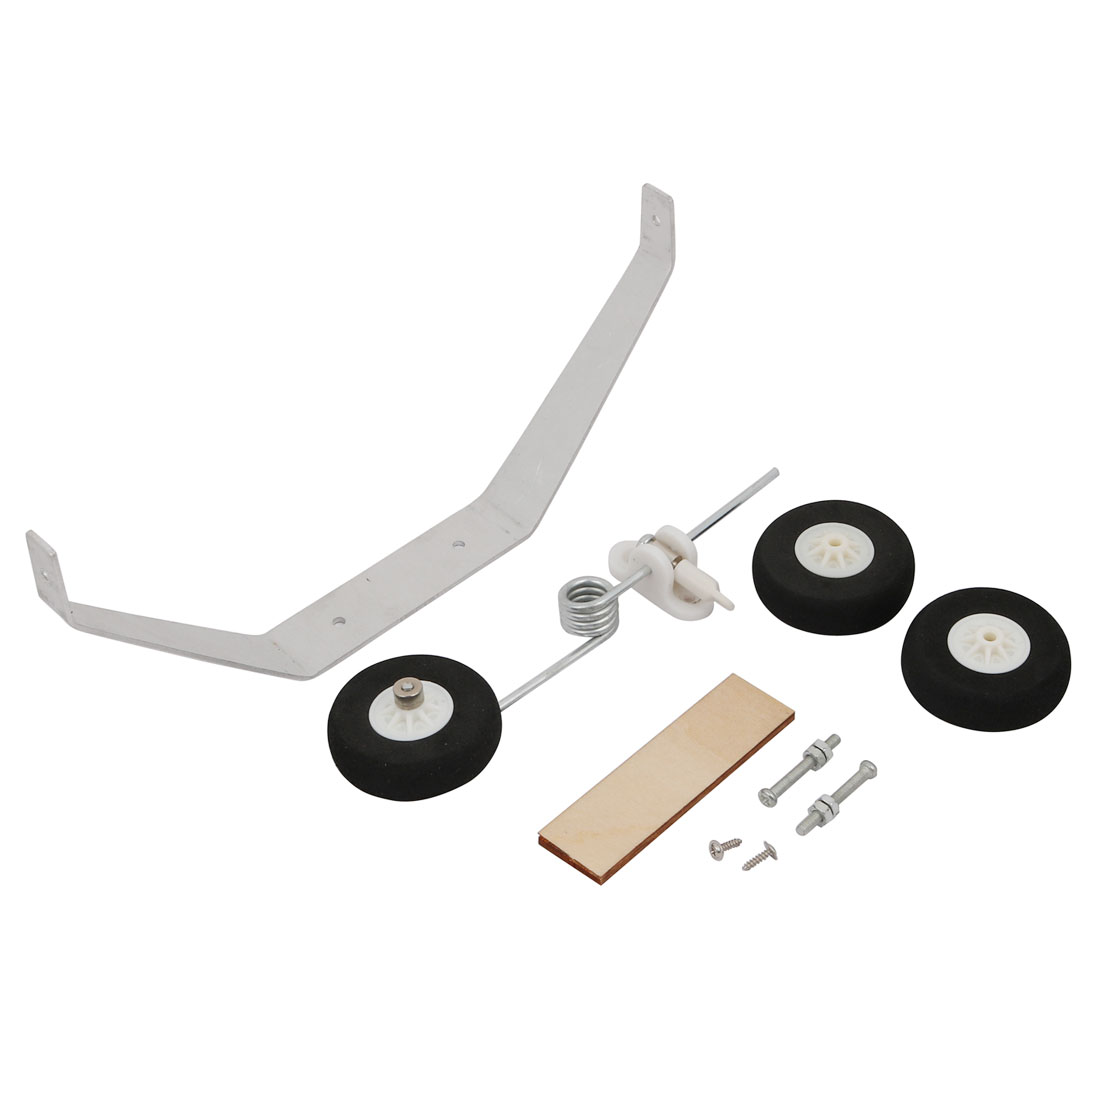 Set 40mm Dia Steerable Tailwheel Assembly Kit Bracket f RC Airplane Foam Planes